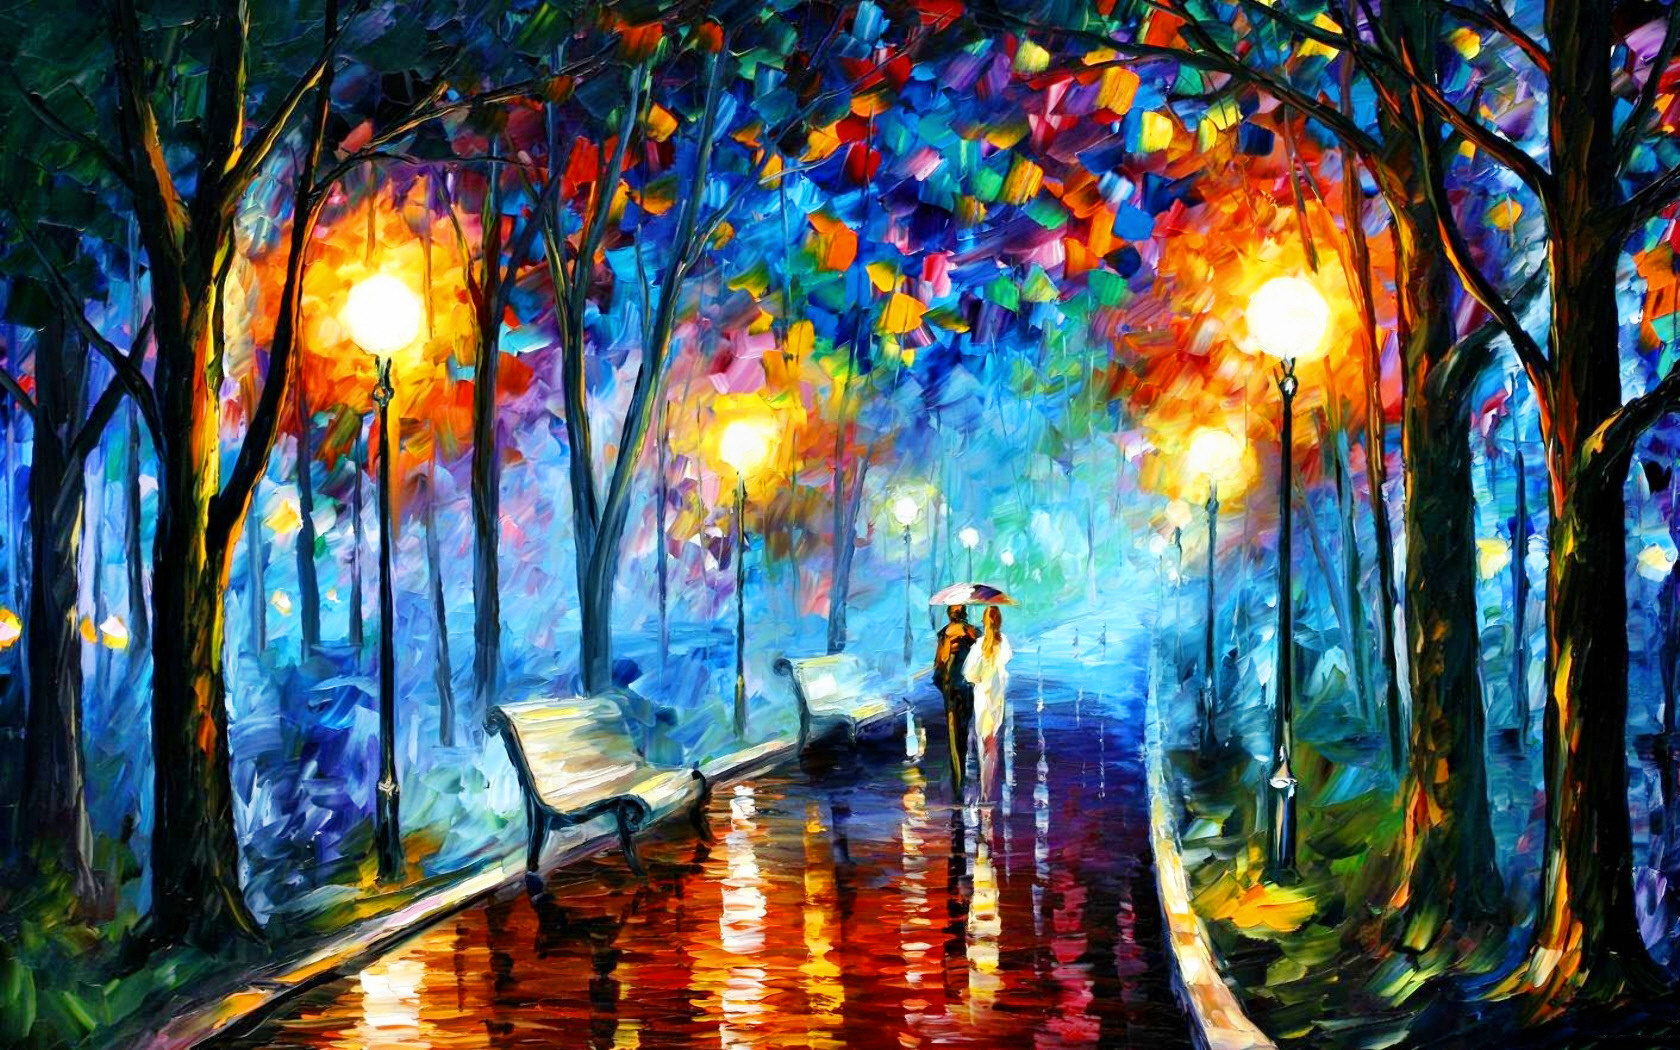 Art Backgrounds on Wallpapers Vista